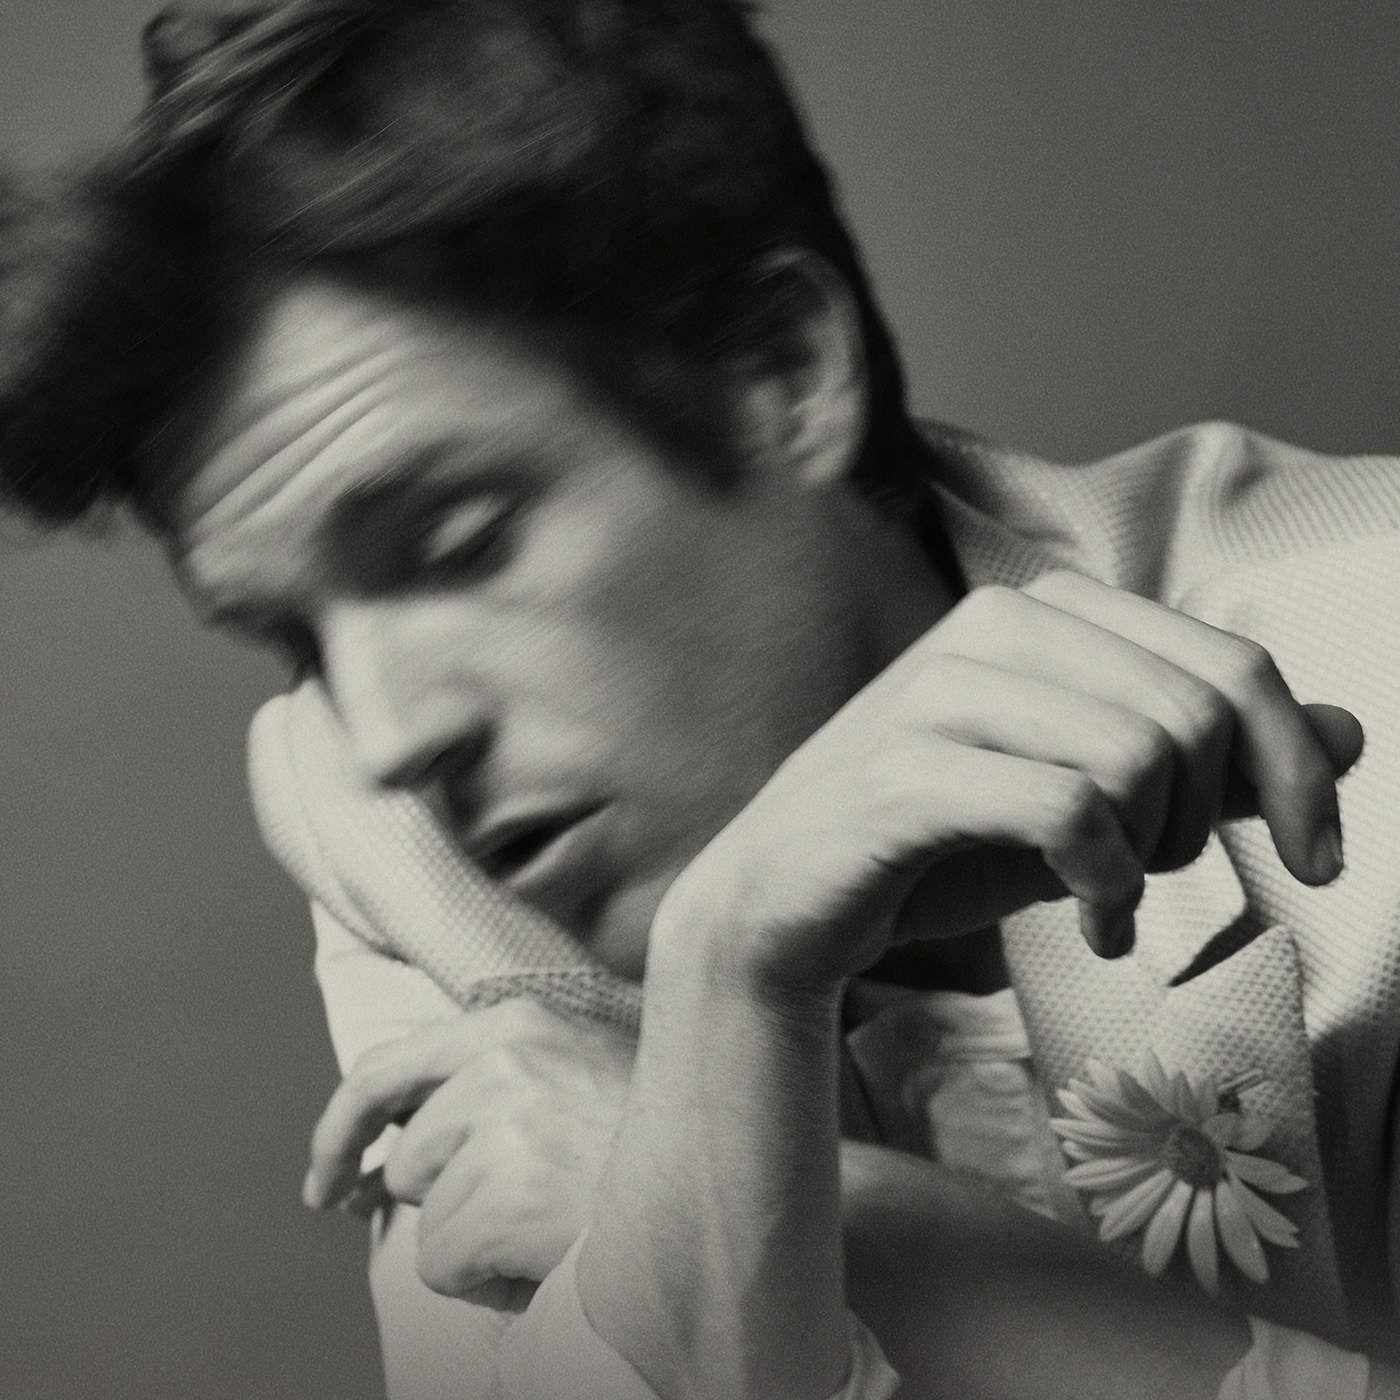 Brandon Flowers - The Desired Effect album cover